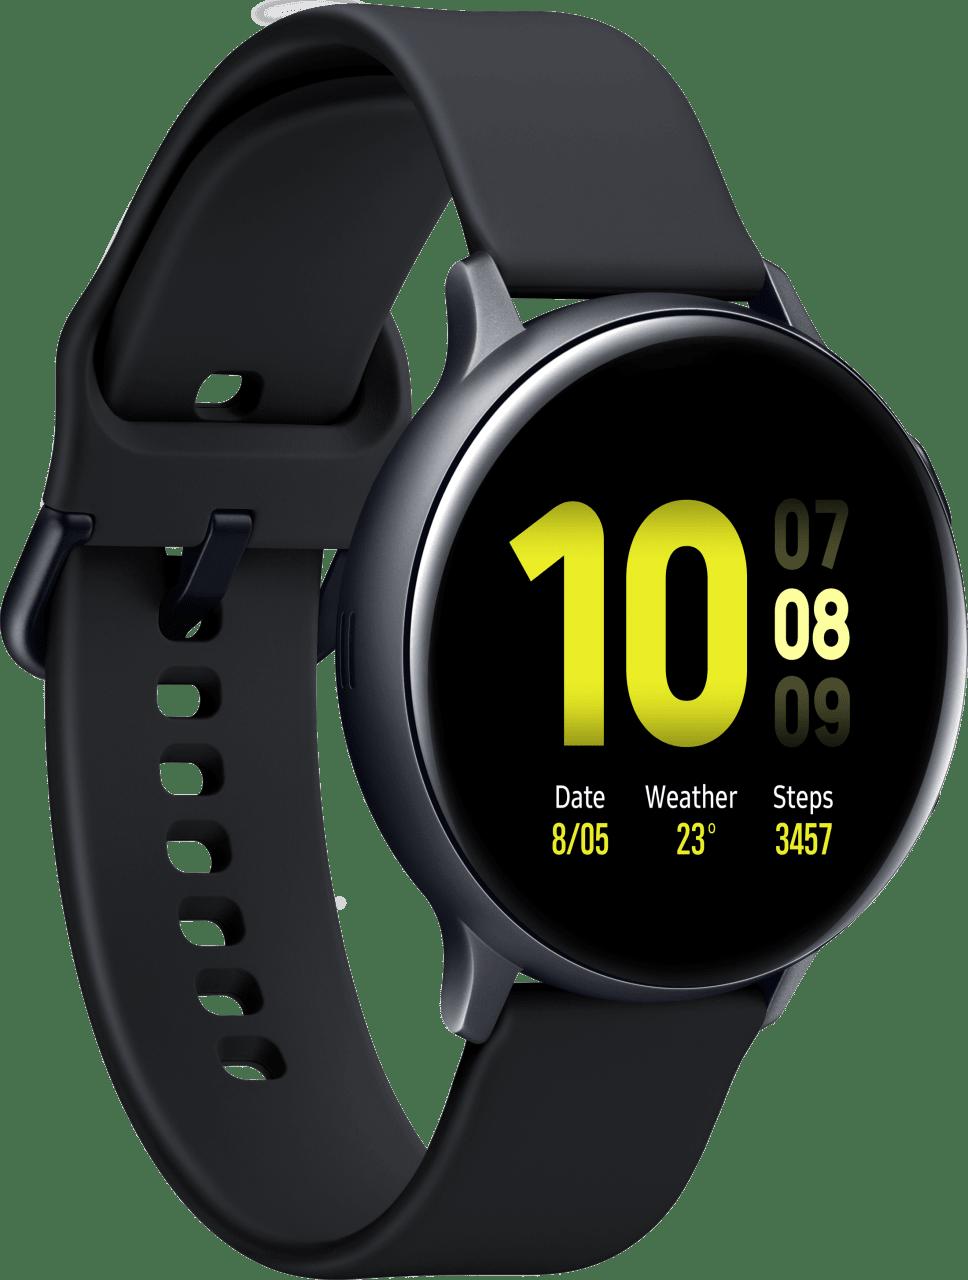 Aqua Black Samsung Galaxy Watch Active2, 44mm Aluminium case, Sport band.2